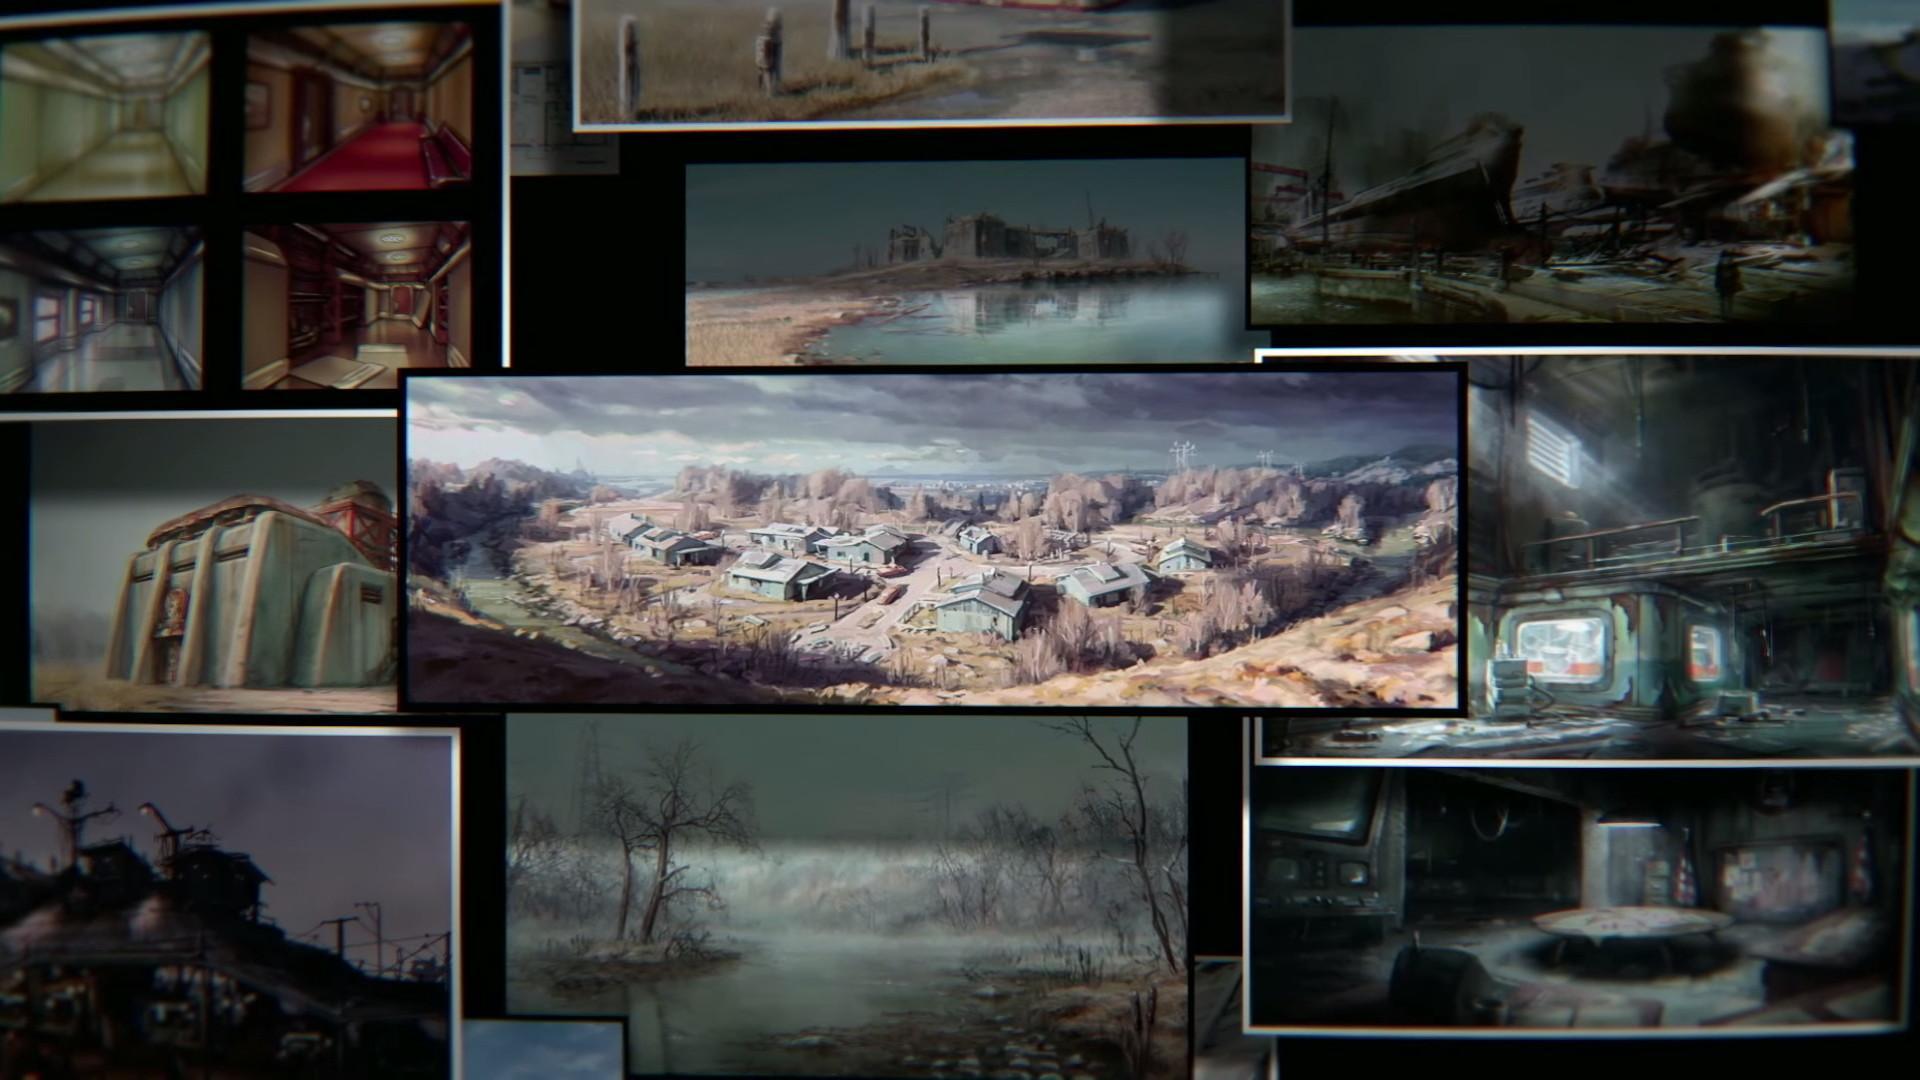 Fallout 4 Concept Art (E3 2015)